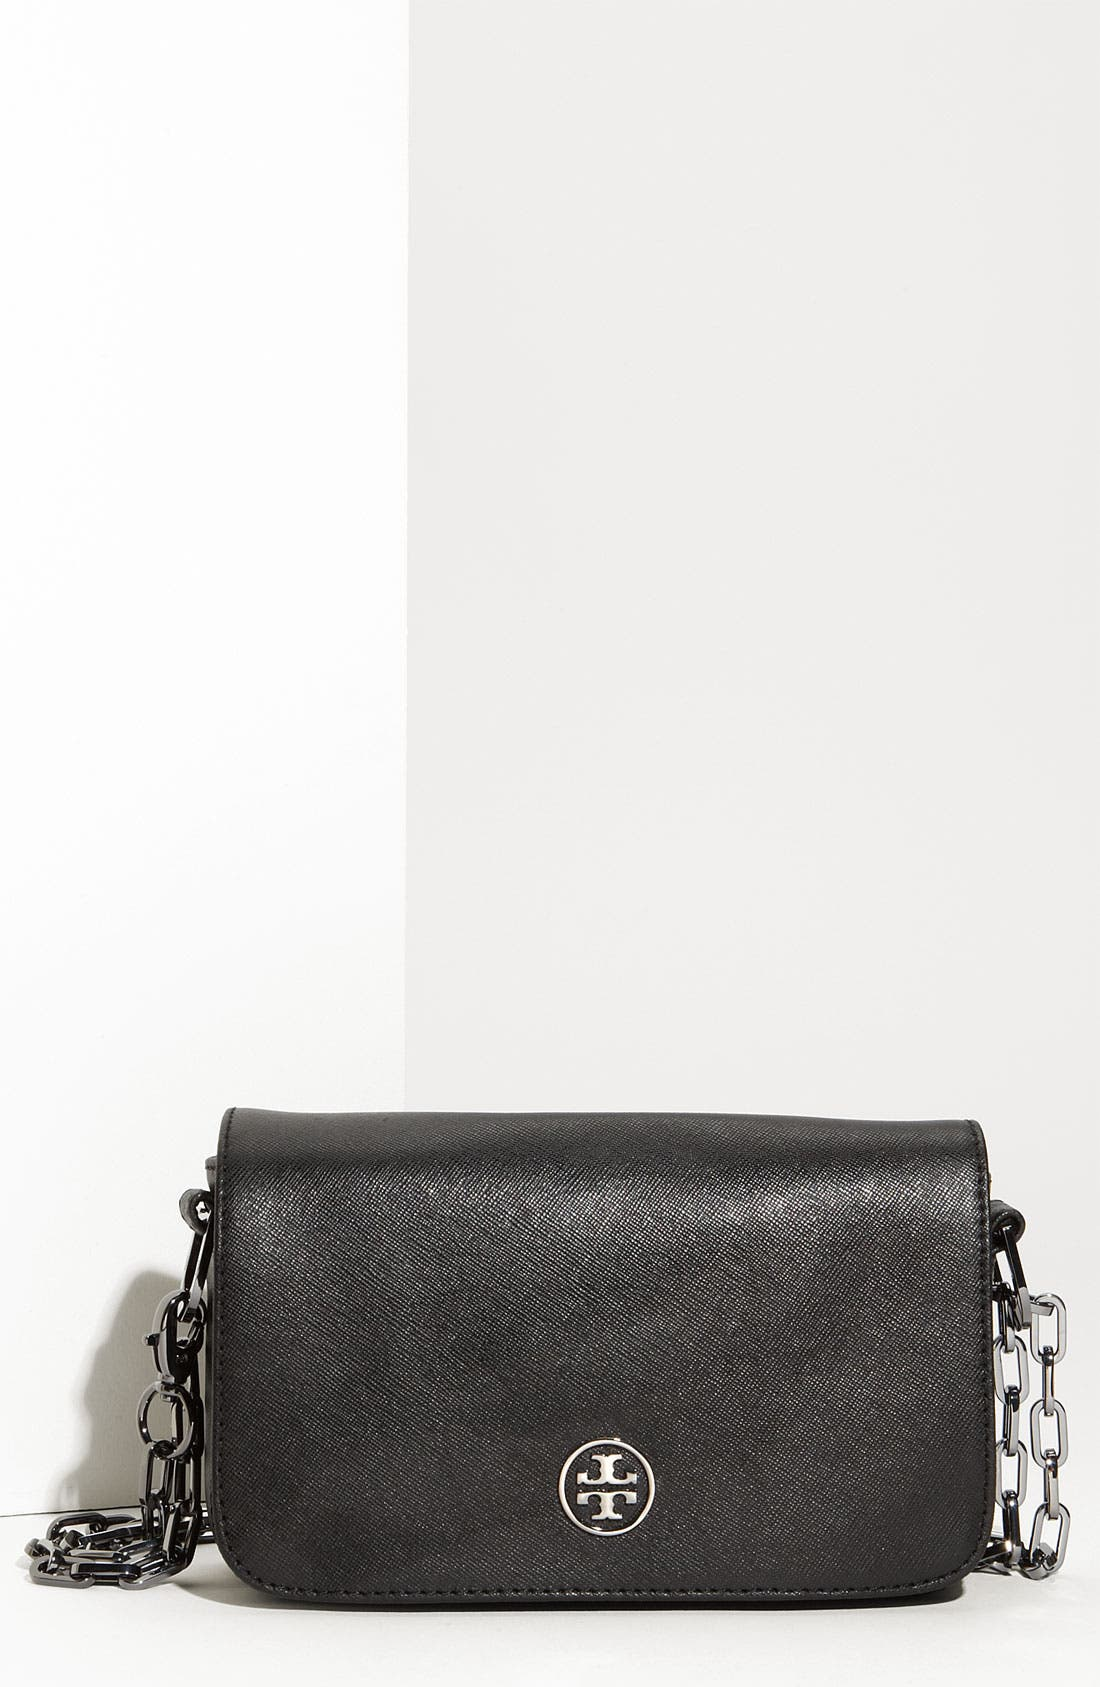 Main Image - Tory Burch 'Robinson - Mini' Crossbody Bag